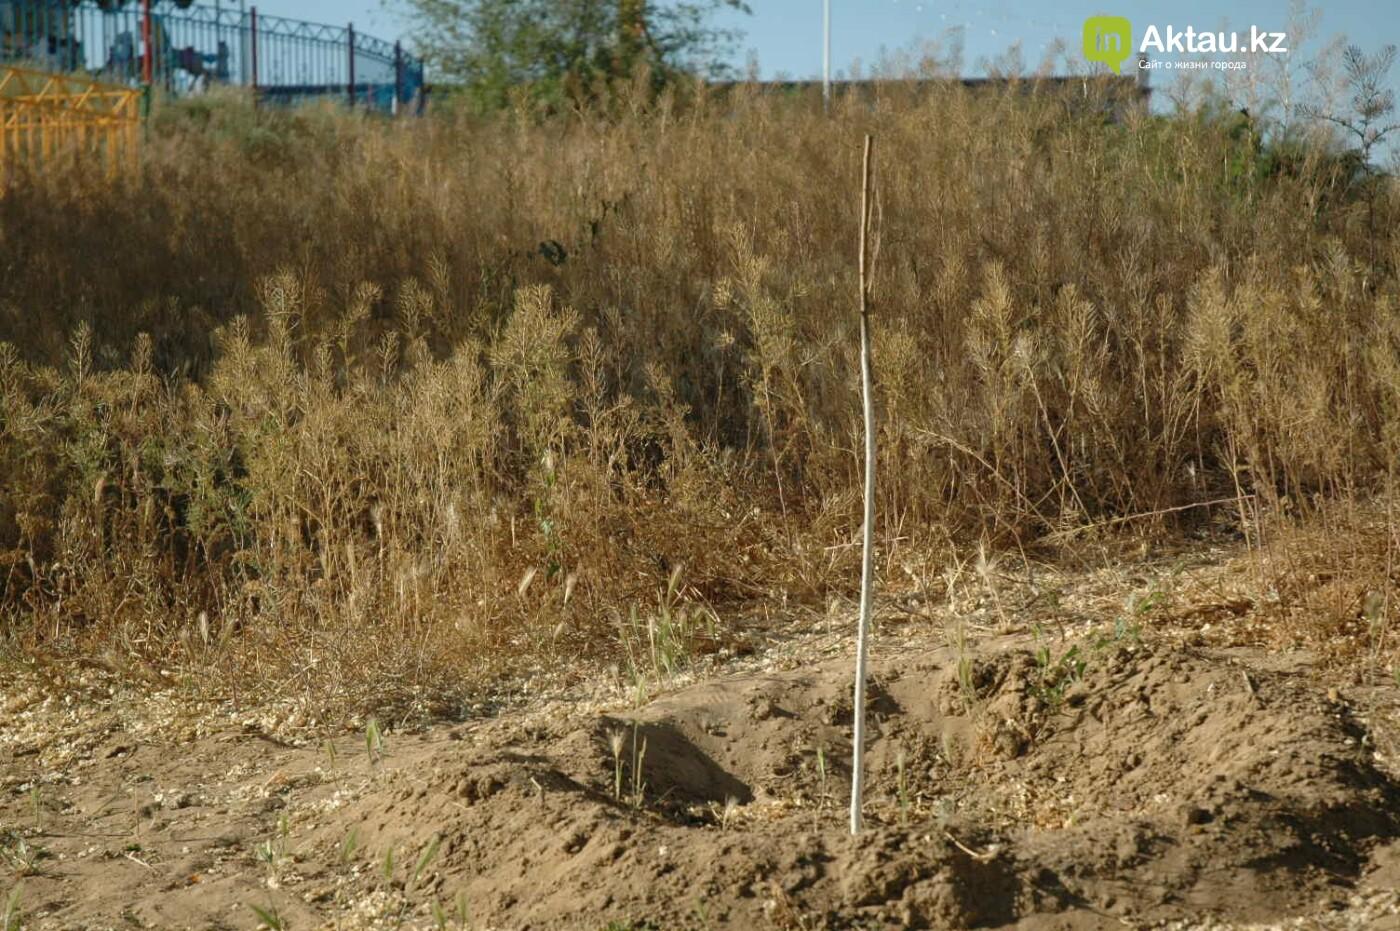 Погибшие от засухи и обезвоживания в Актау исчисляются десятками (ФОТО), фото-47